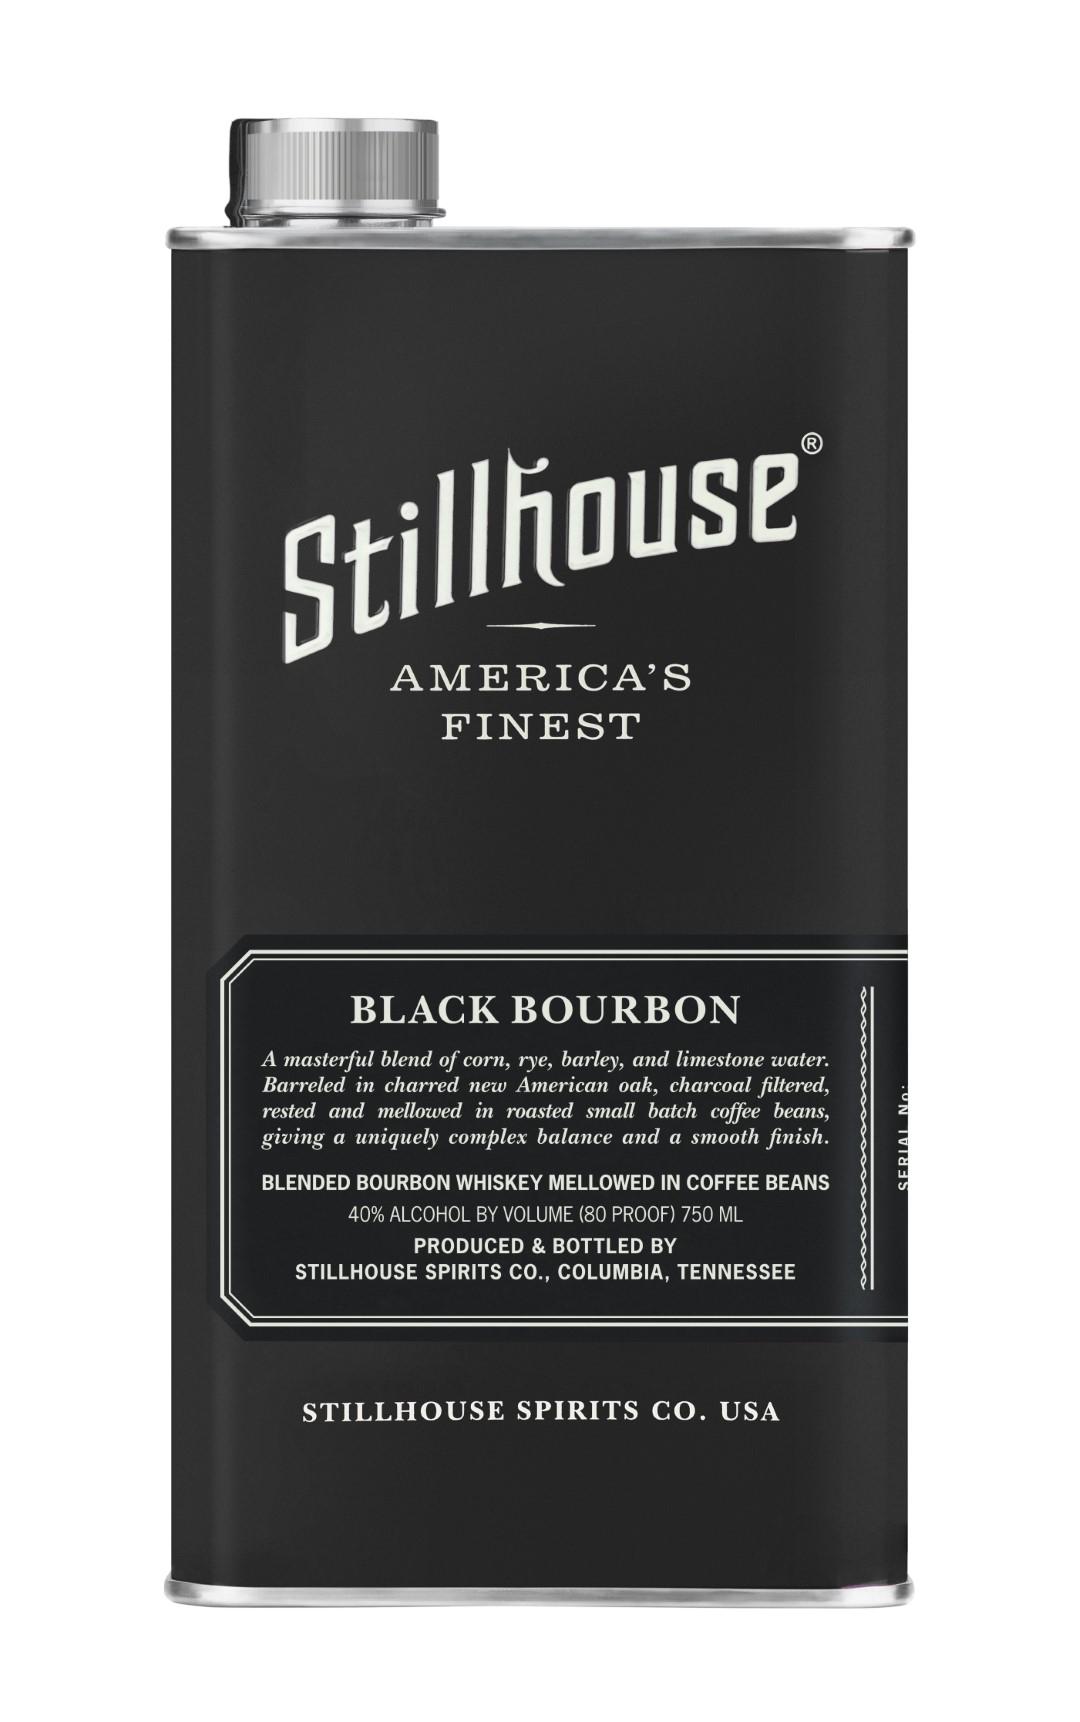 Stillhouse Black Bourbon